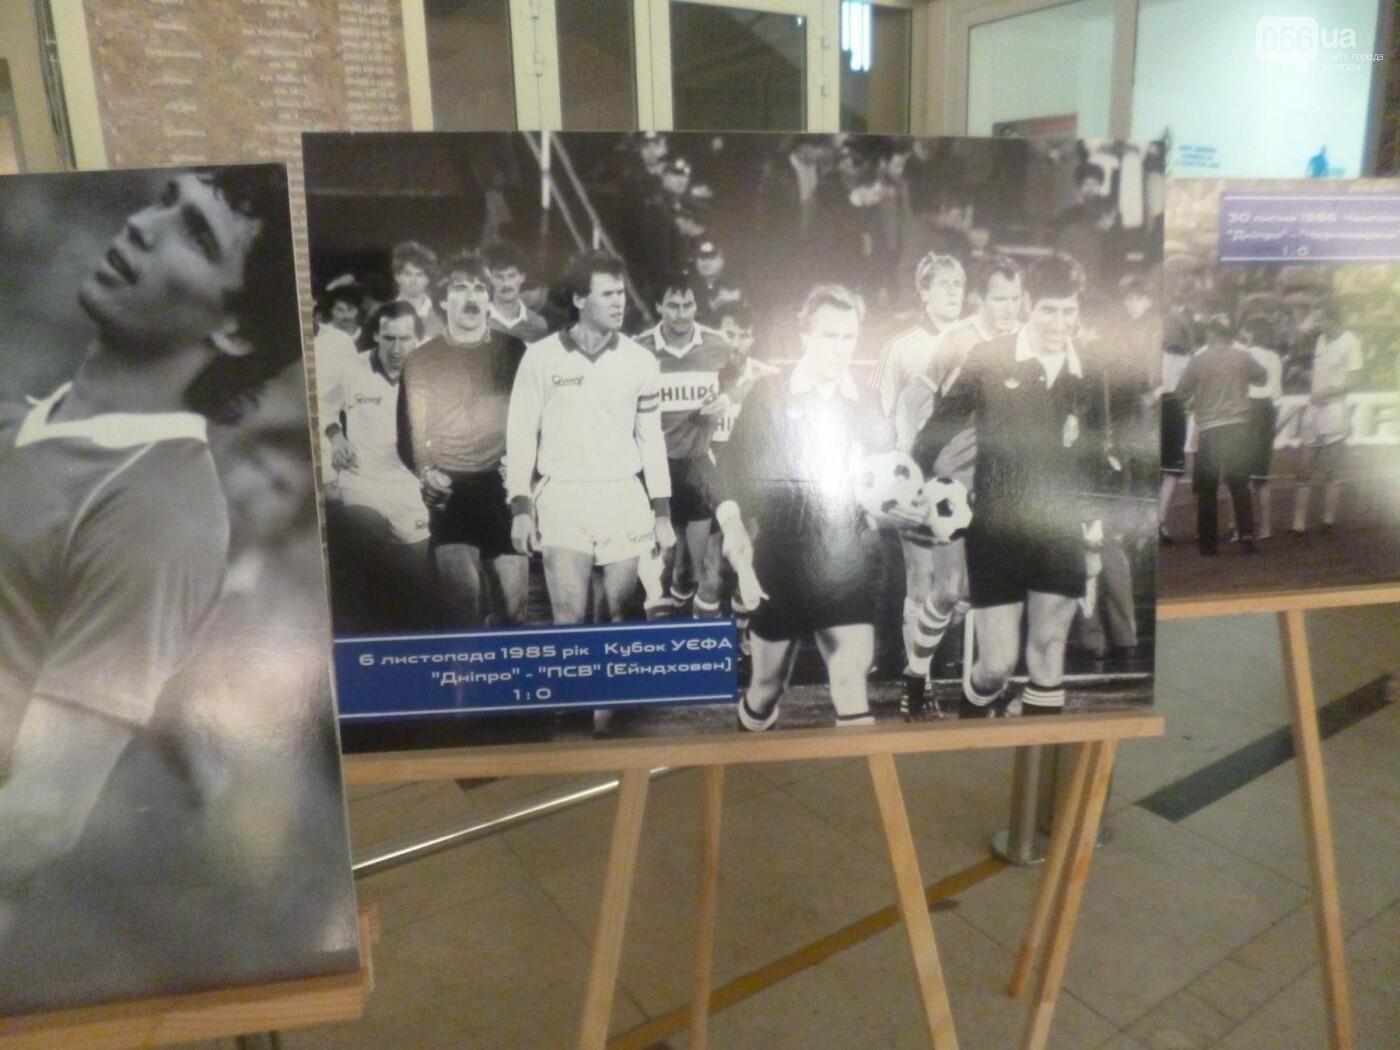 В Днепре отметили 100-летие создания ФК «Днепр», - ФОТО, фото-15